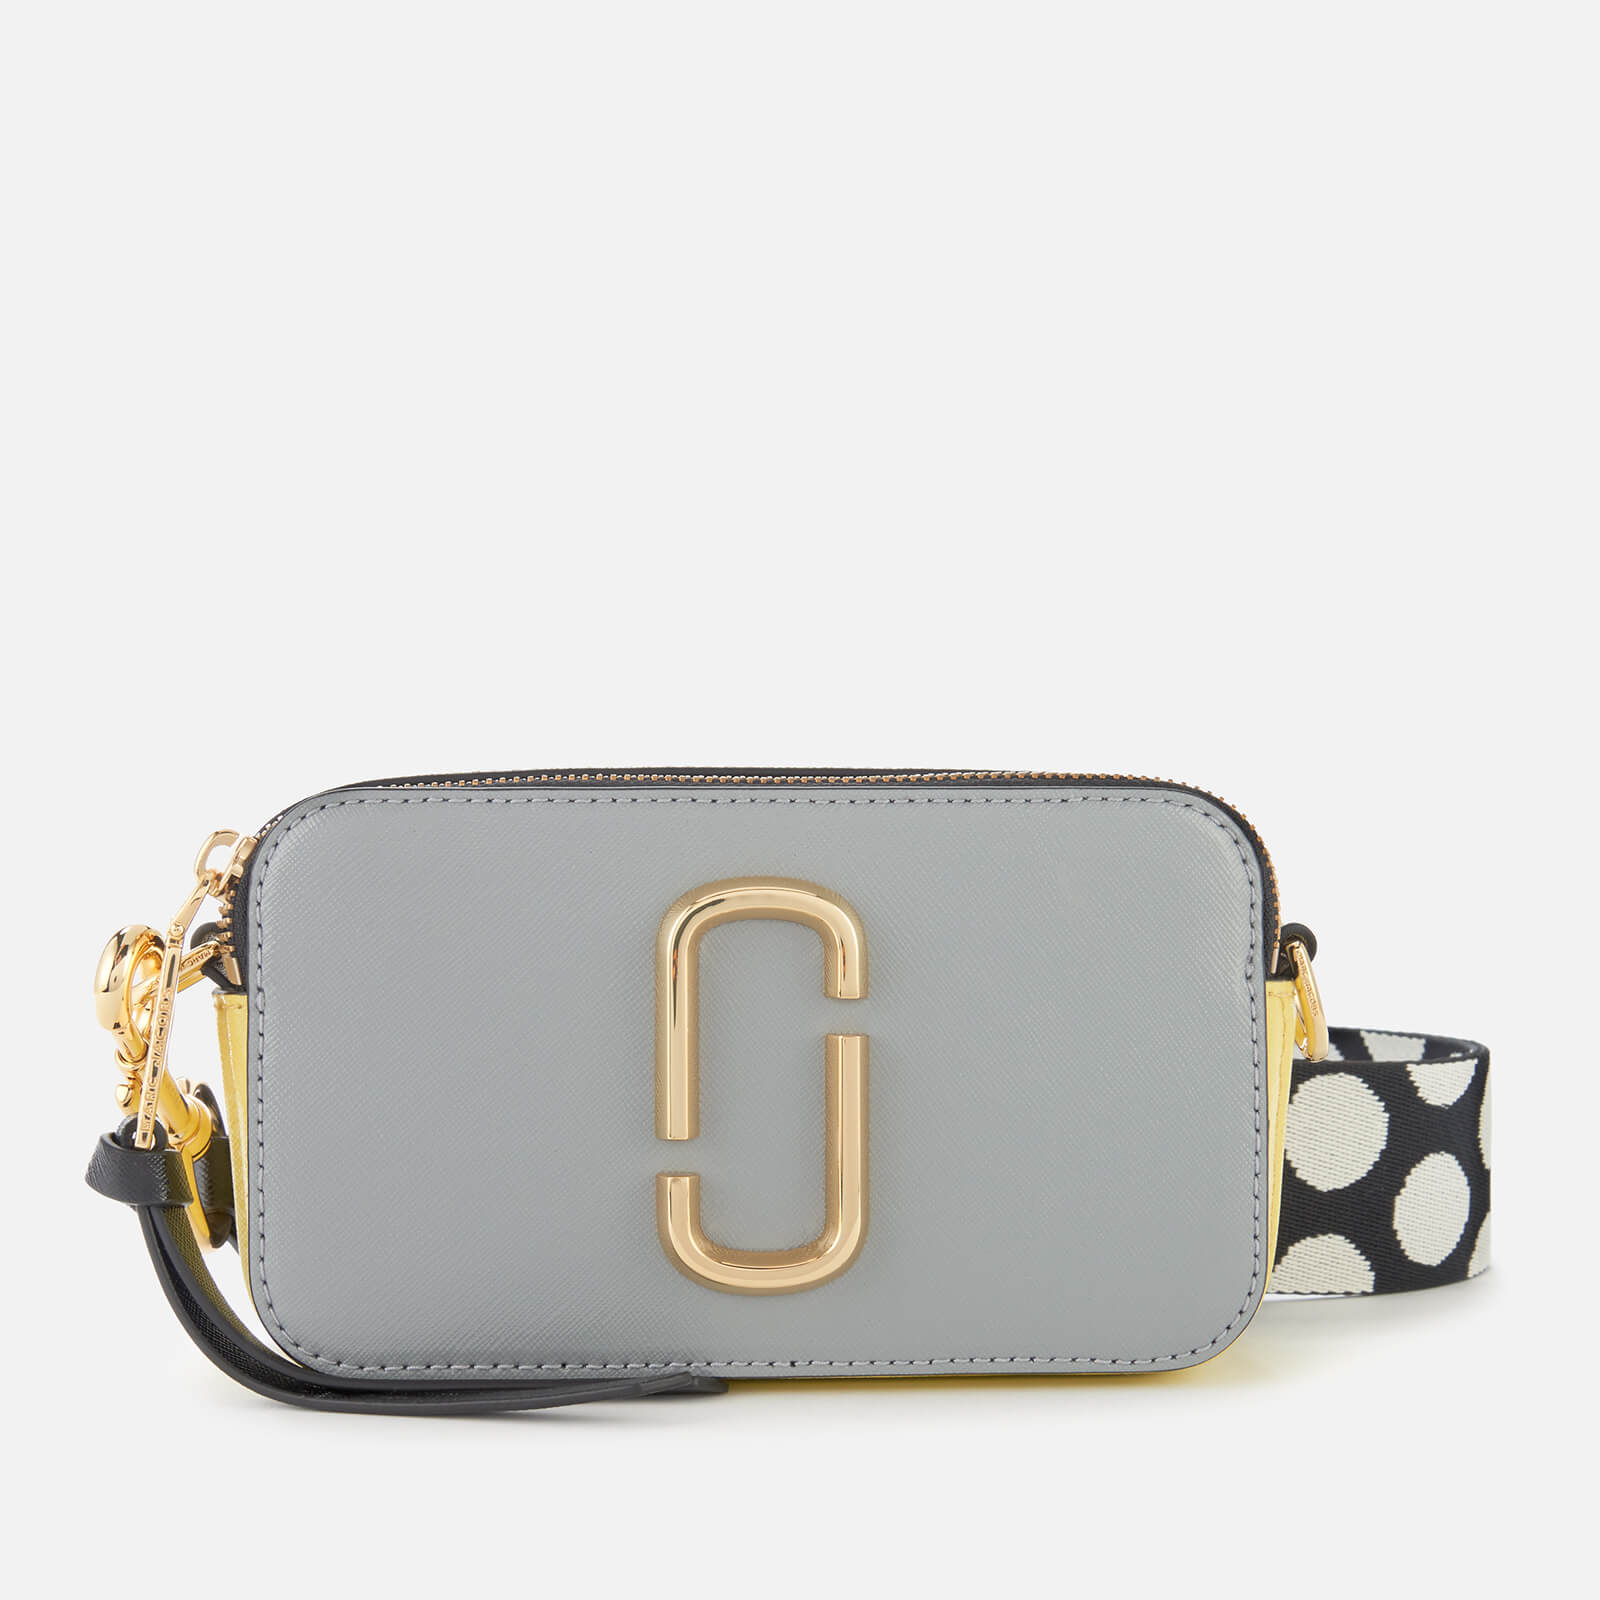 634645655481 Marc Jacobs Women's Snapshot Bag - Rock Grey Multi